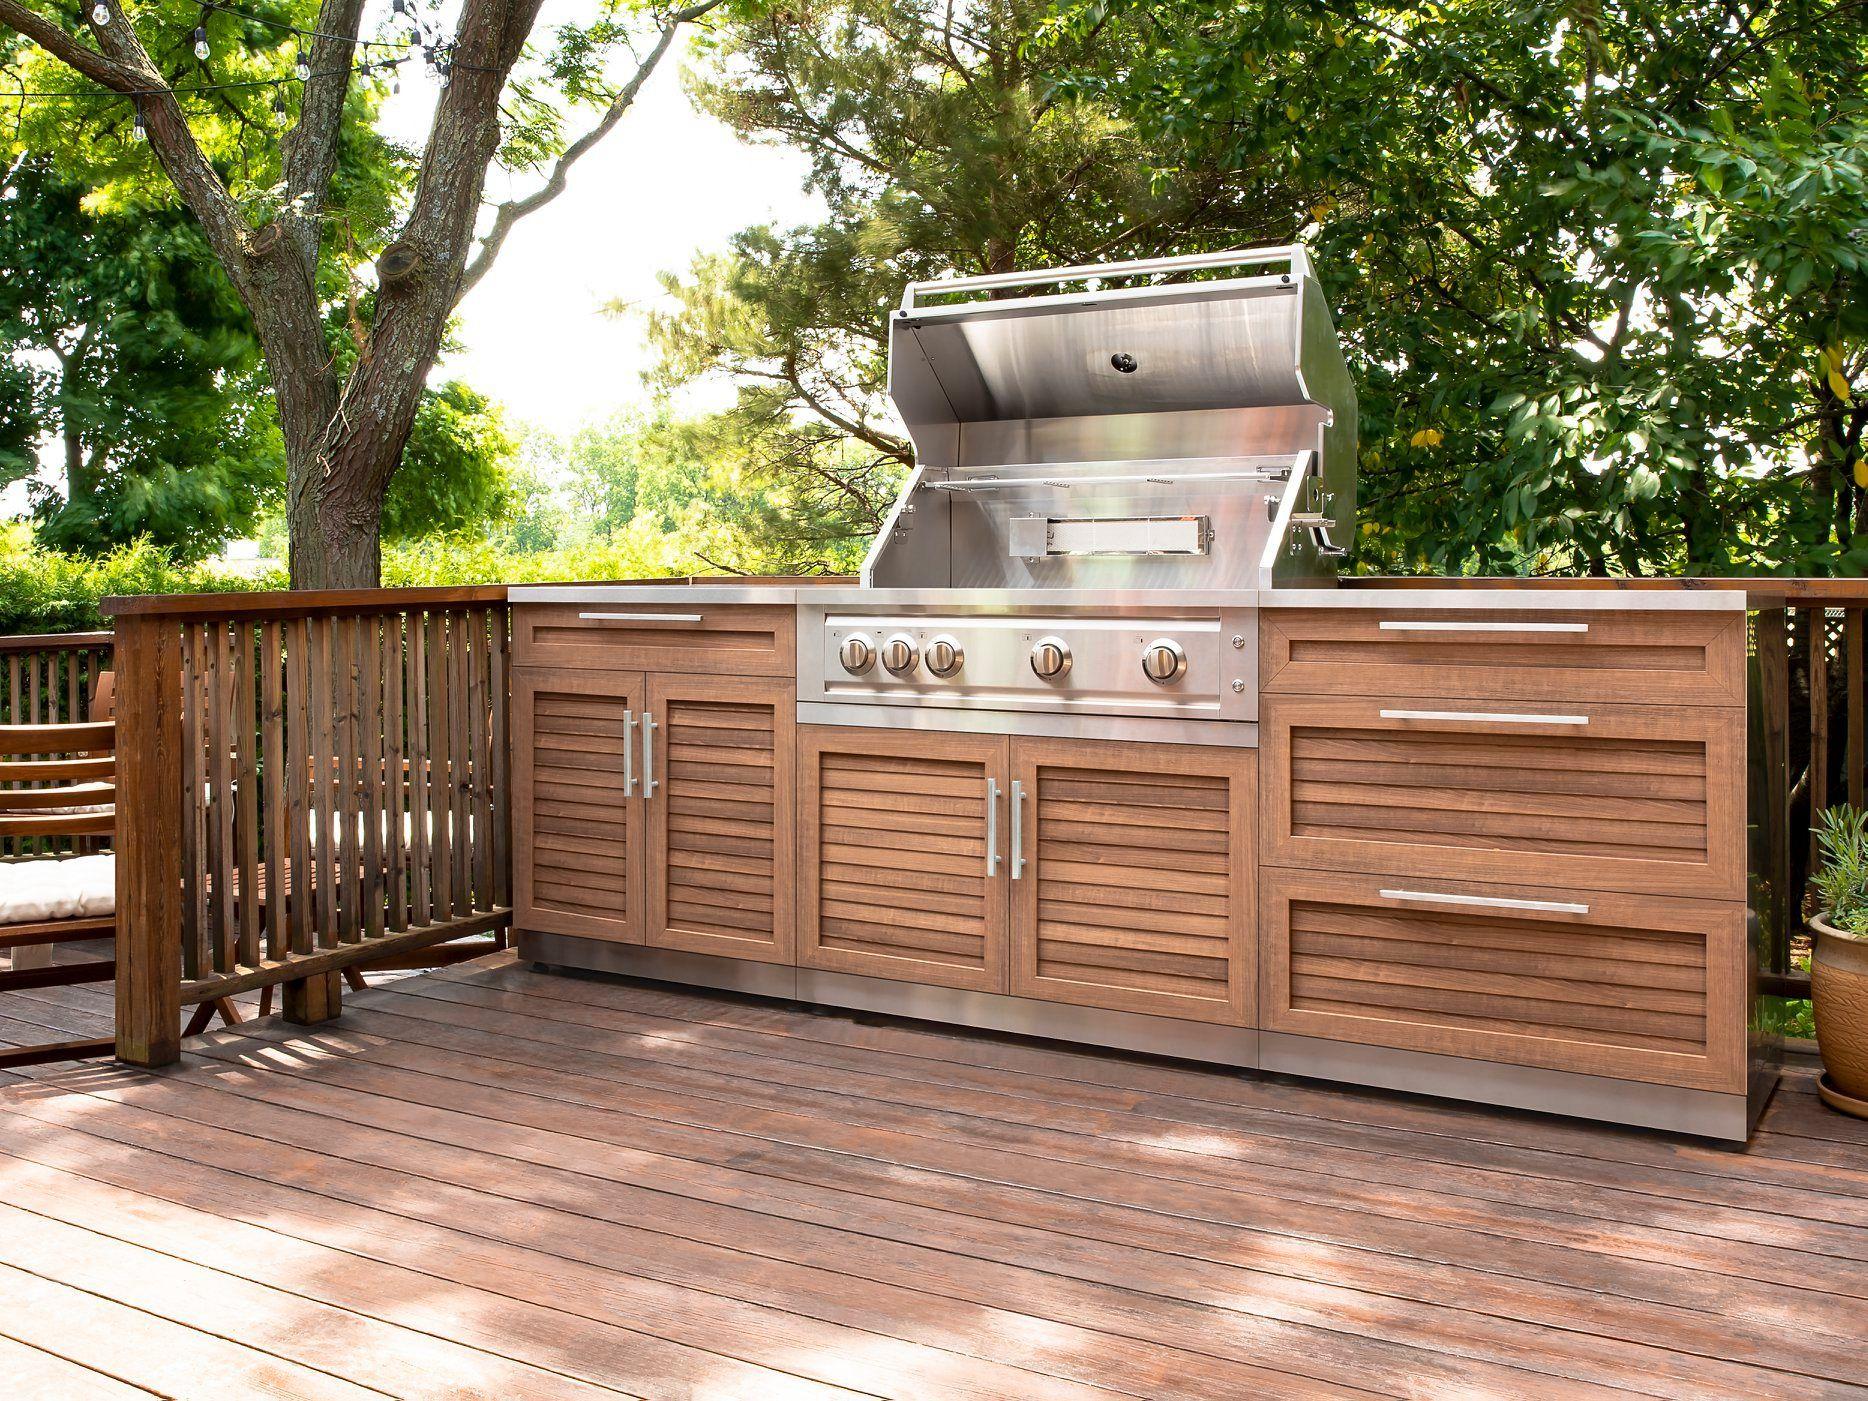 Outdoor Kitchen Stainless Steel 3 Piece Cabinet Set in ...